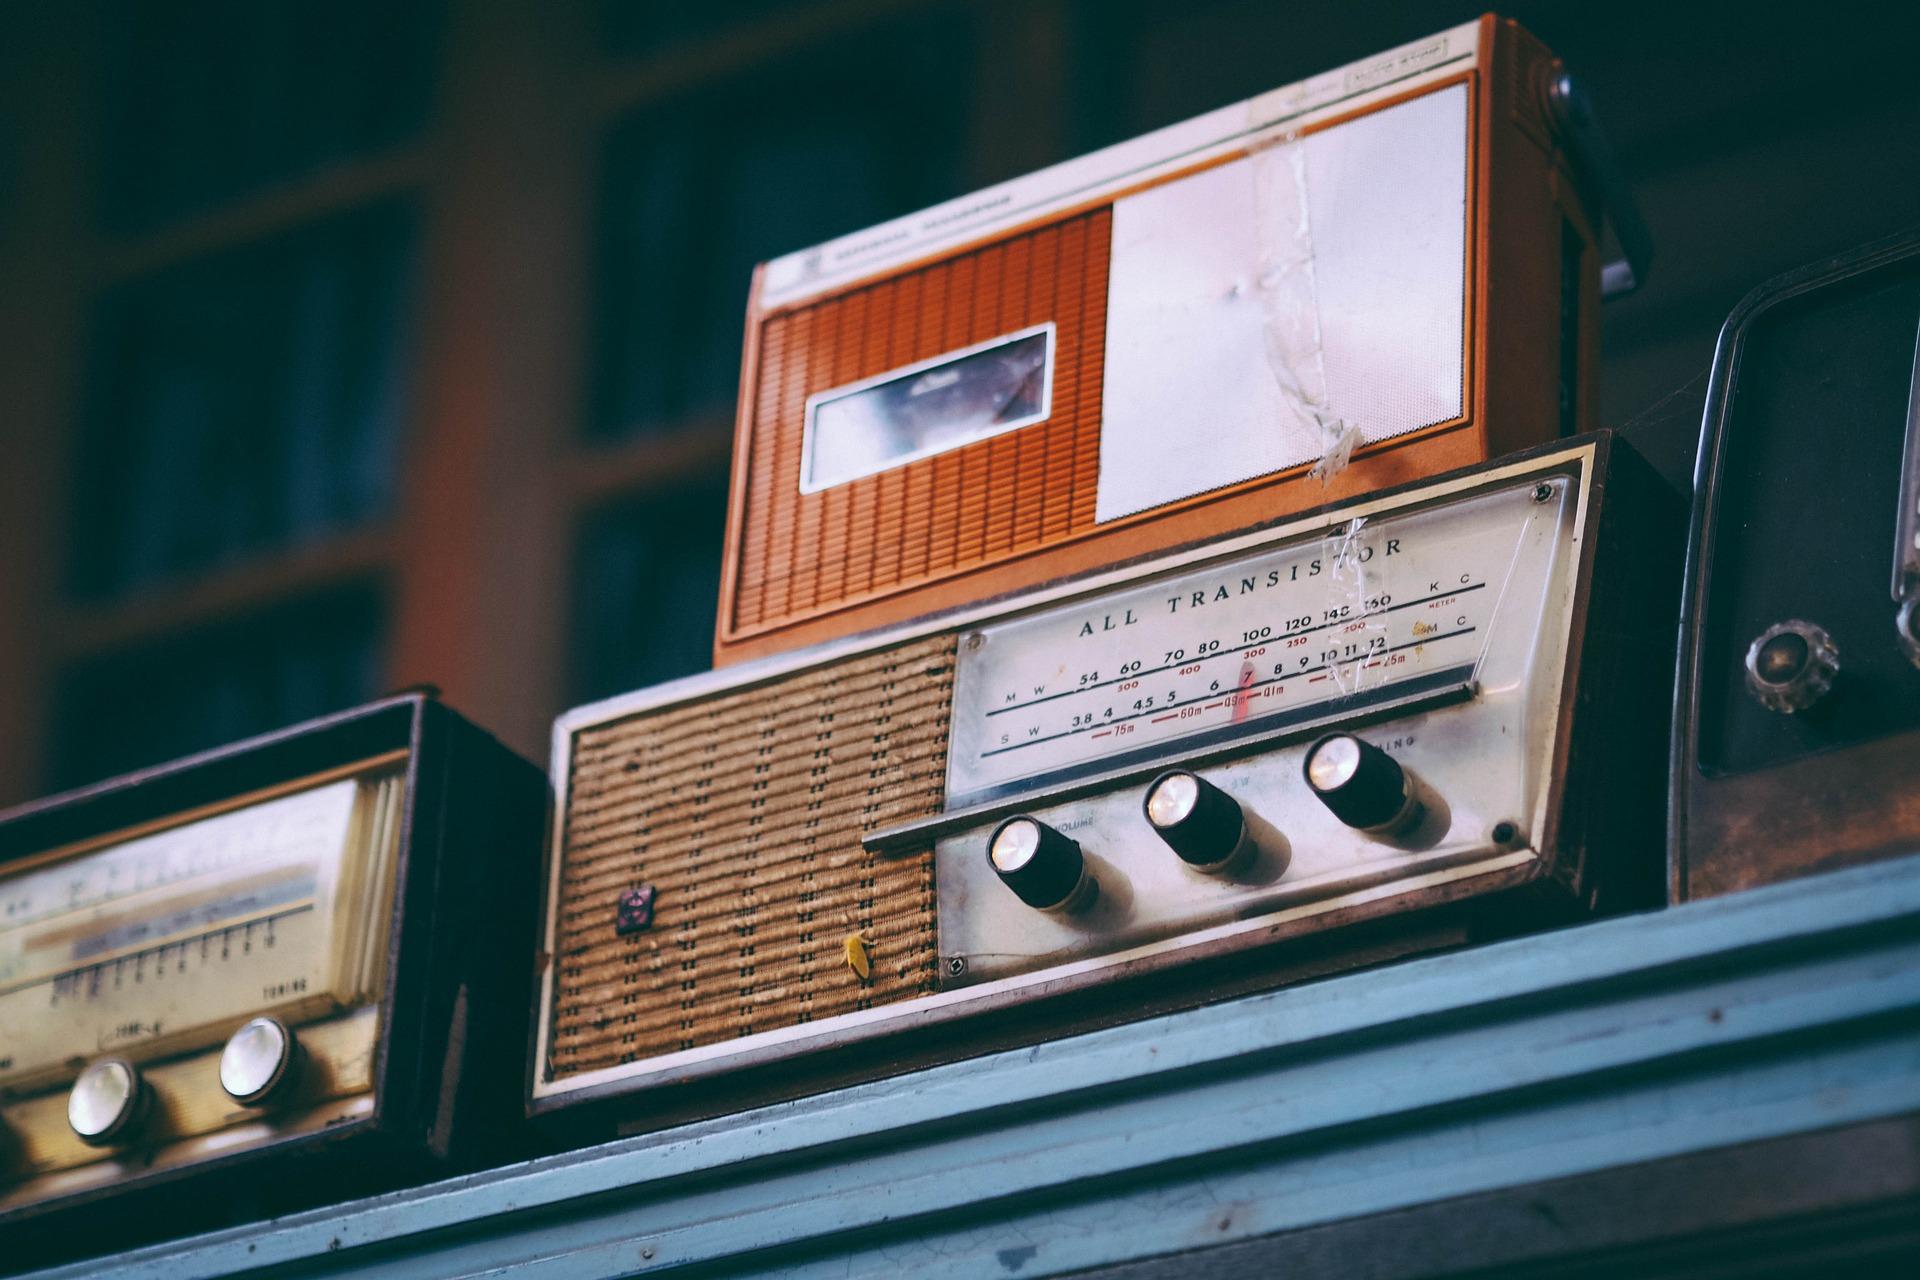 V Ukraїni z'javyťsja peršyj Muzej radio- i telezv'jazku